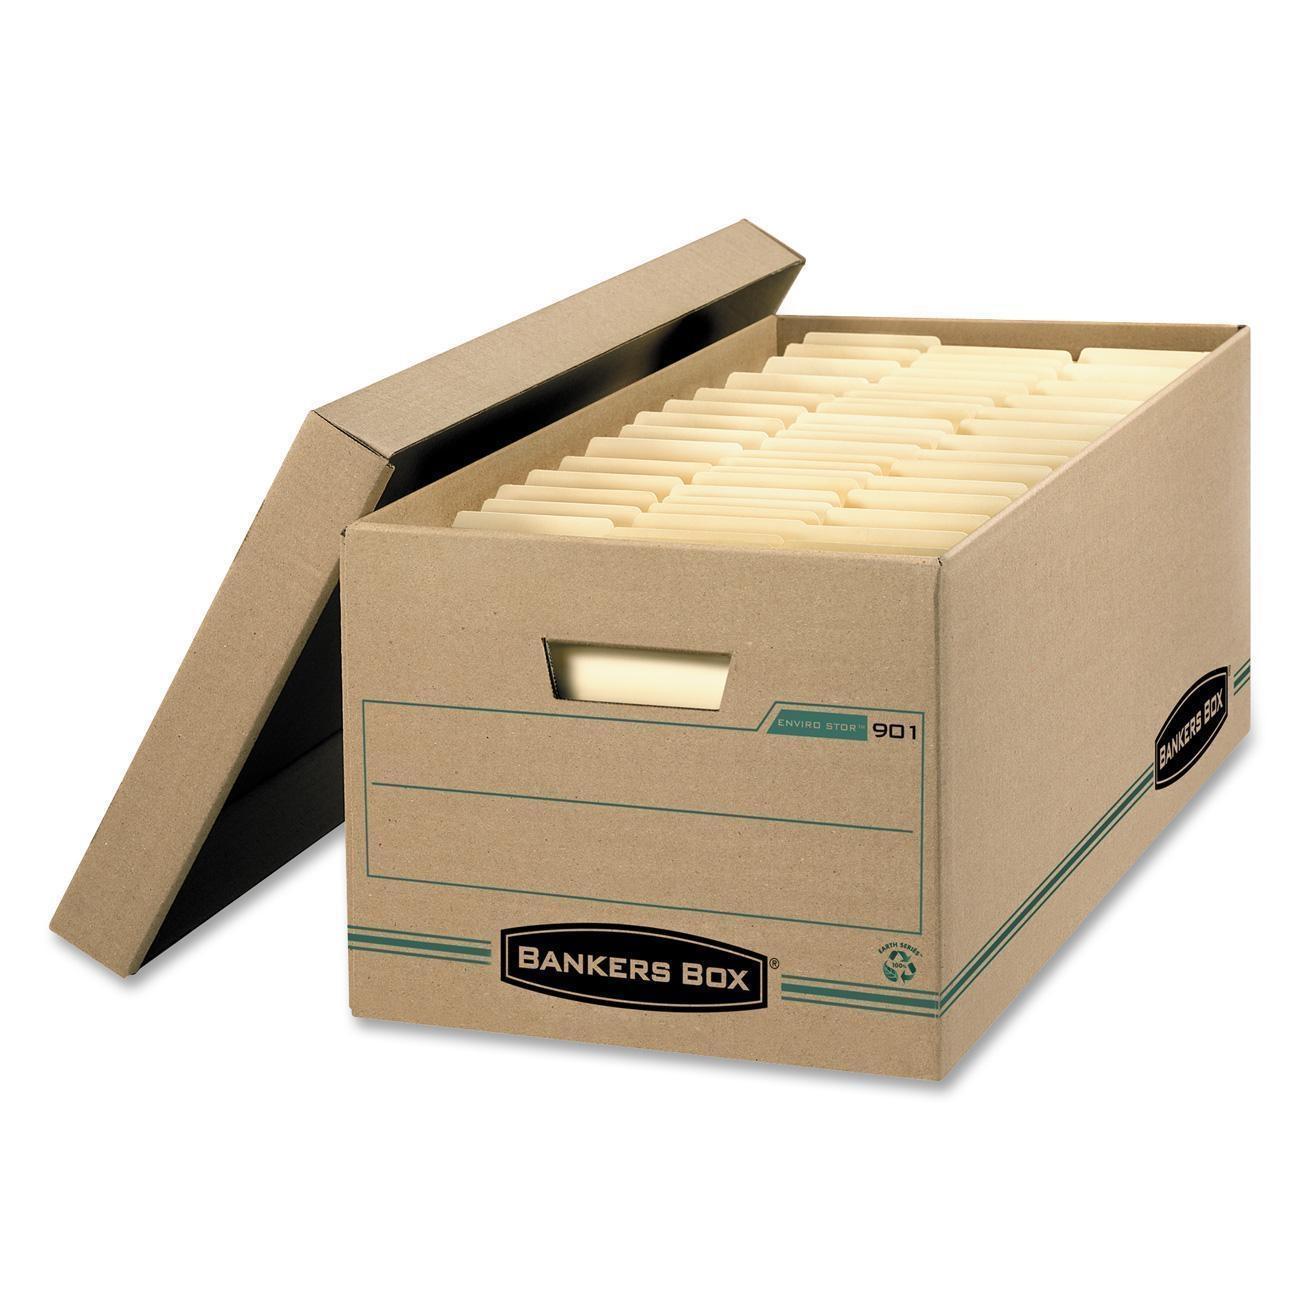 Bankers Box Enviro-Stor 900 Basic-Duty Storage Box, 12|Pack